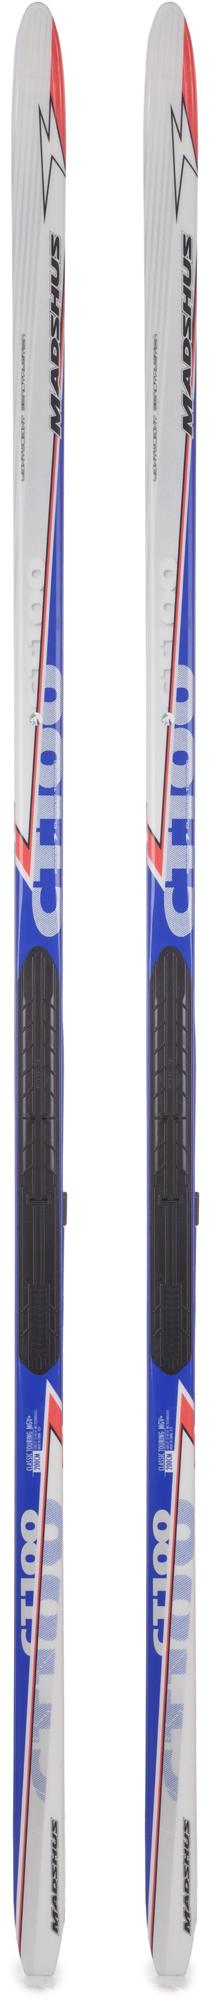 Madshus Беговые лыжи Madshus CT 100 MGV+ Skis XC sport лыжи беговые tisa sport wax